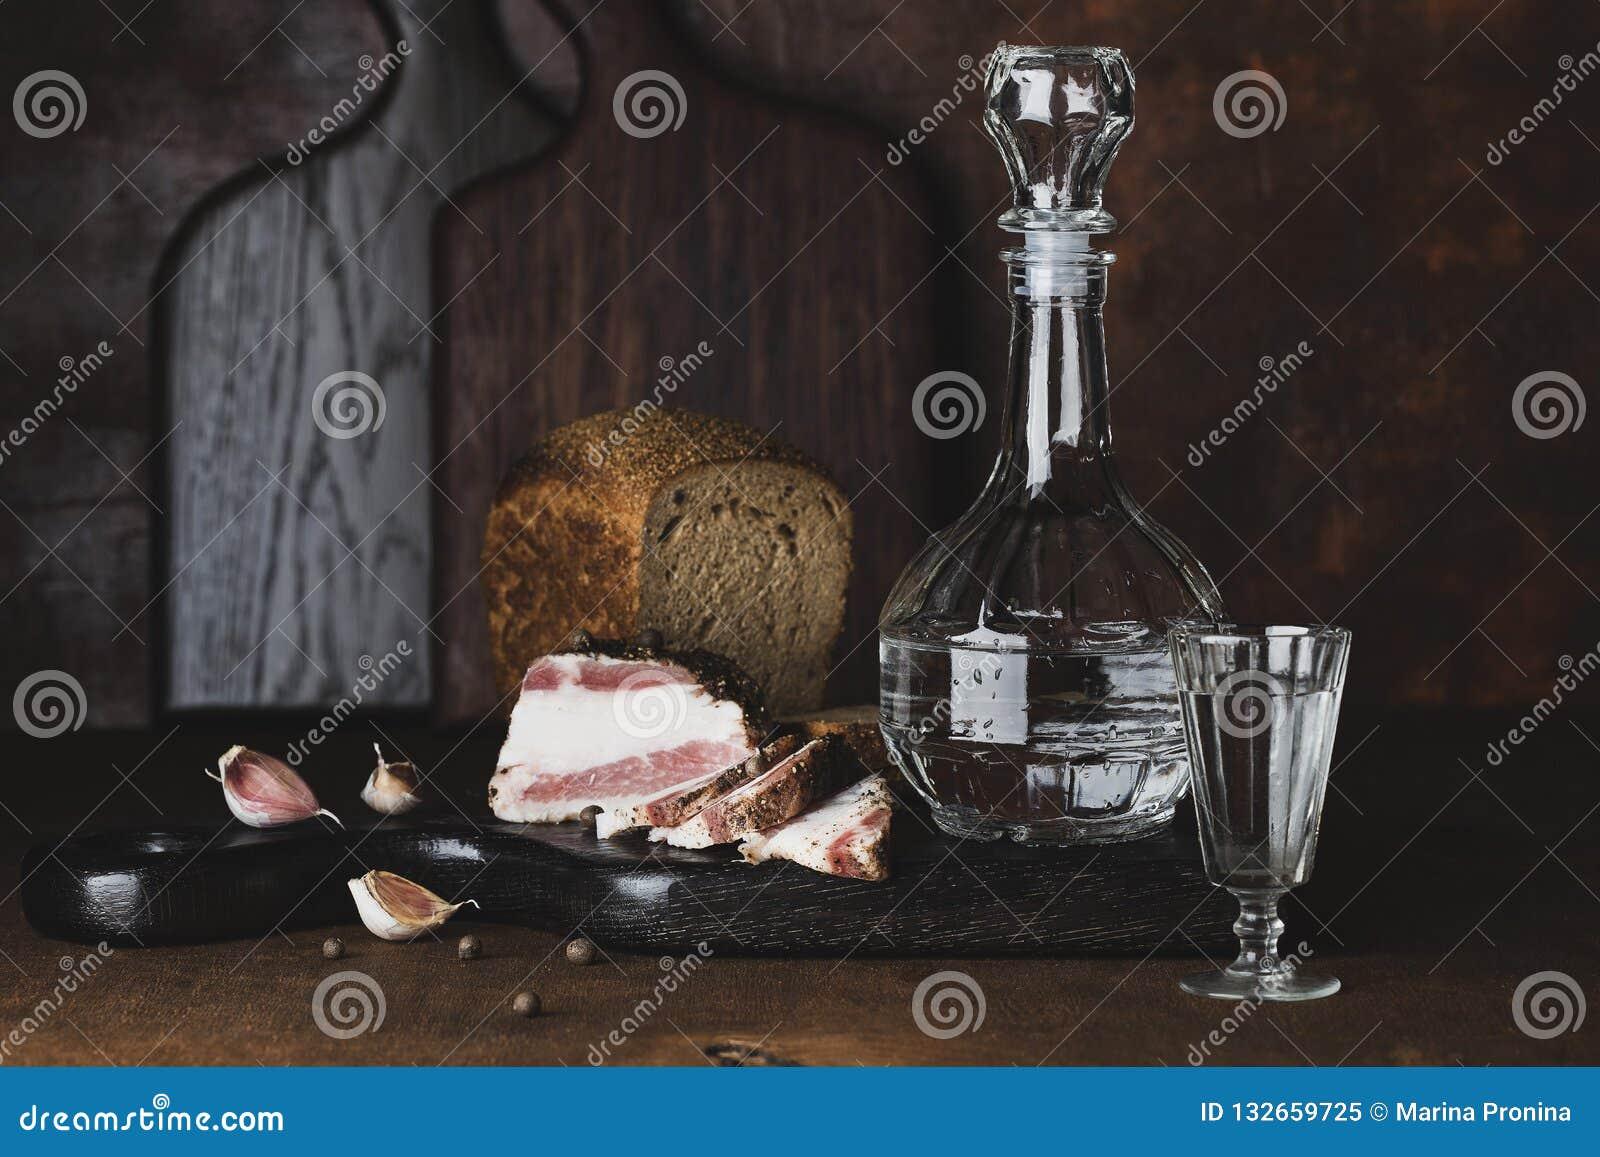 Still life with vodka, bread and lard